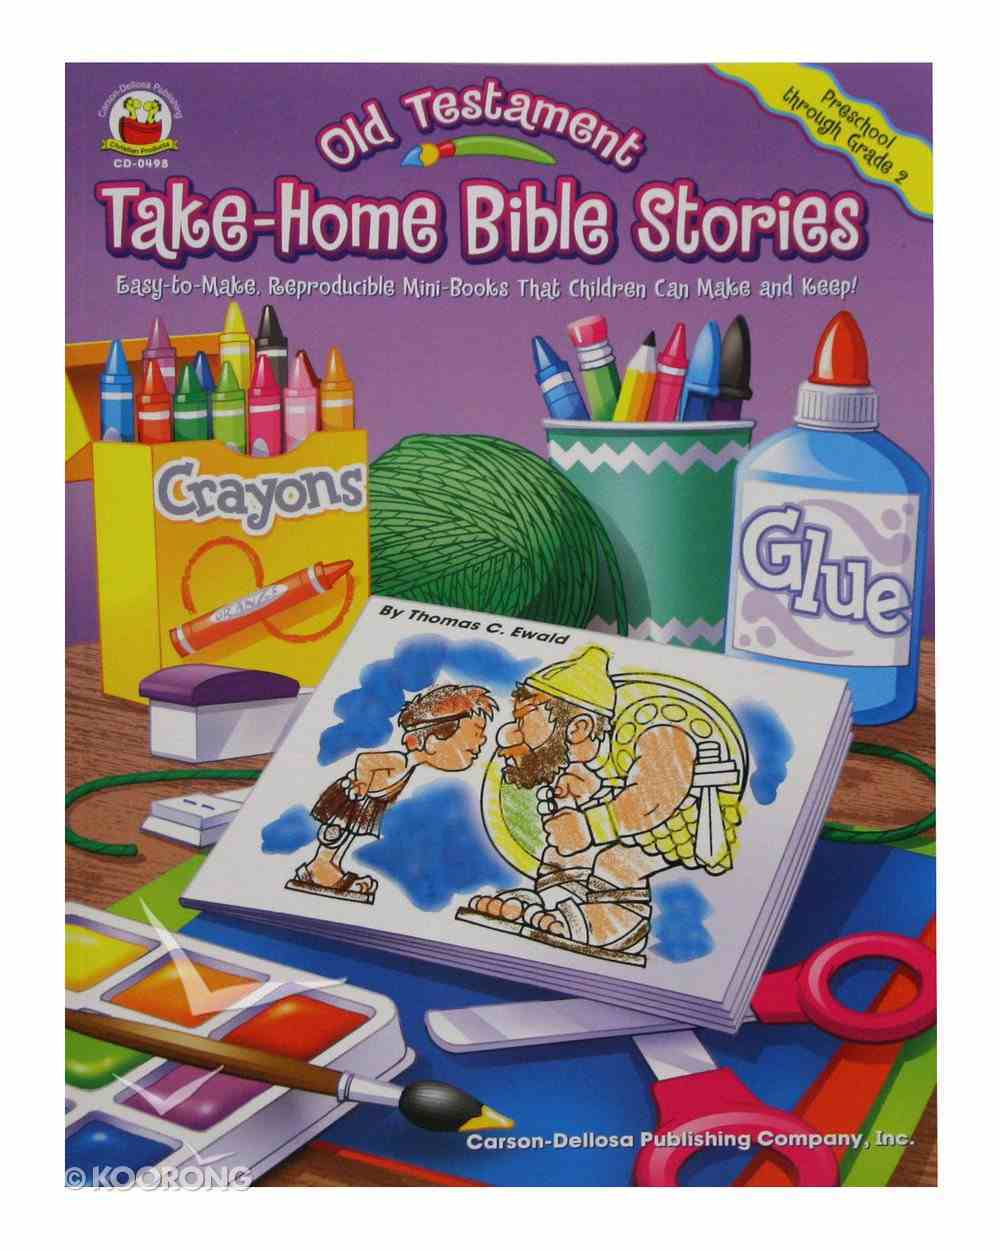 Take-Home Bible Stories: Old Testament Paperback